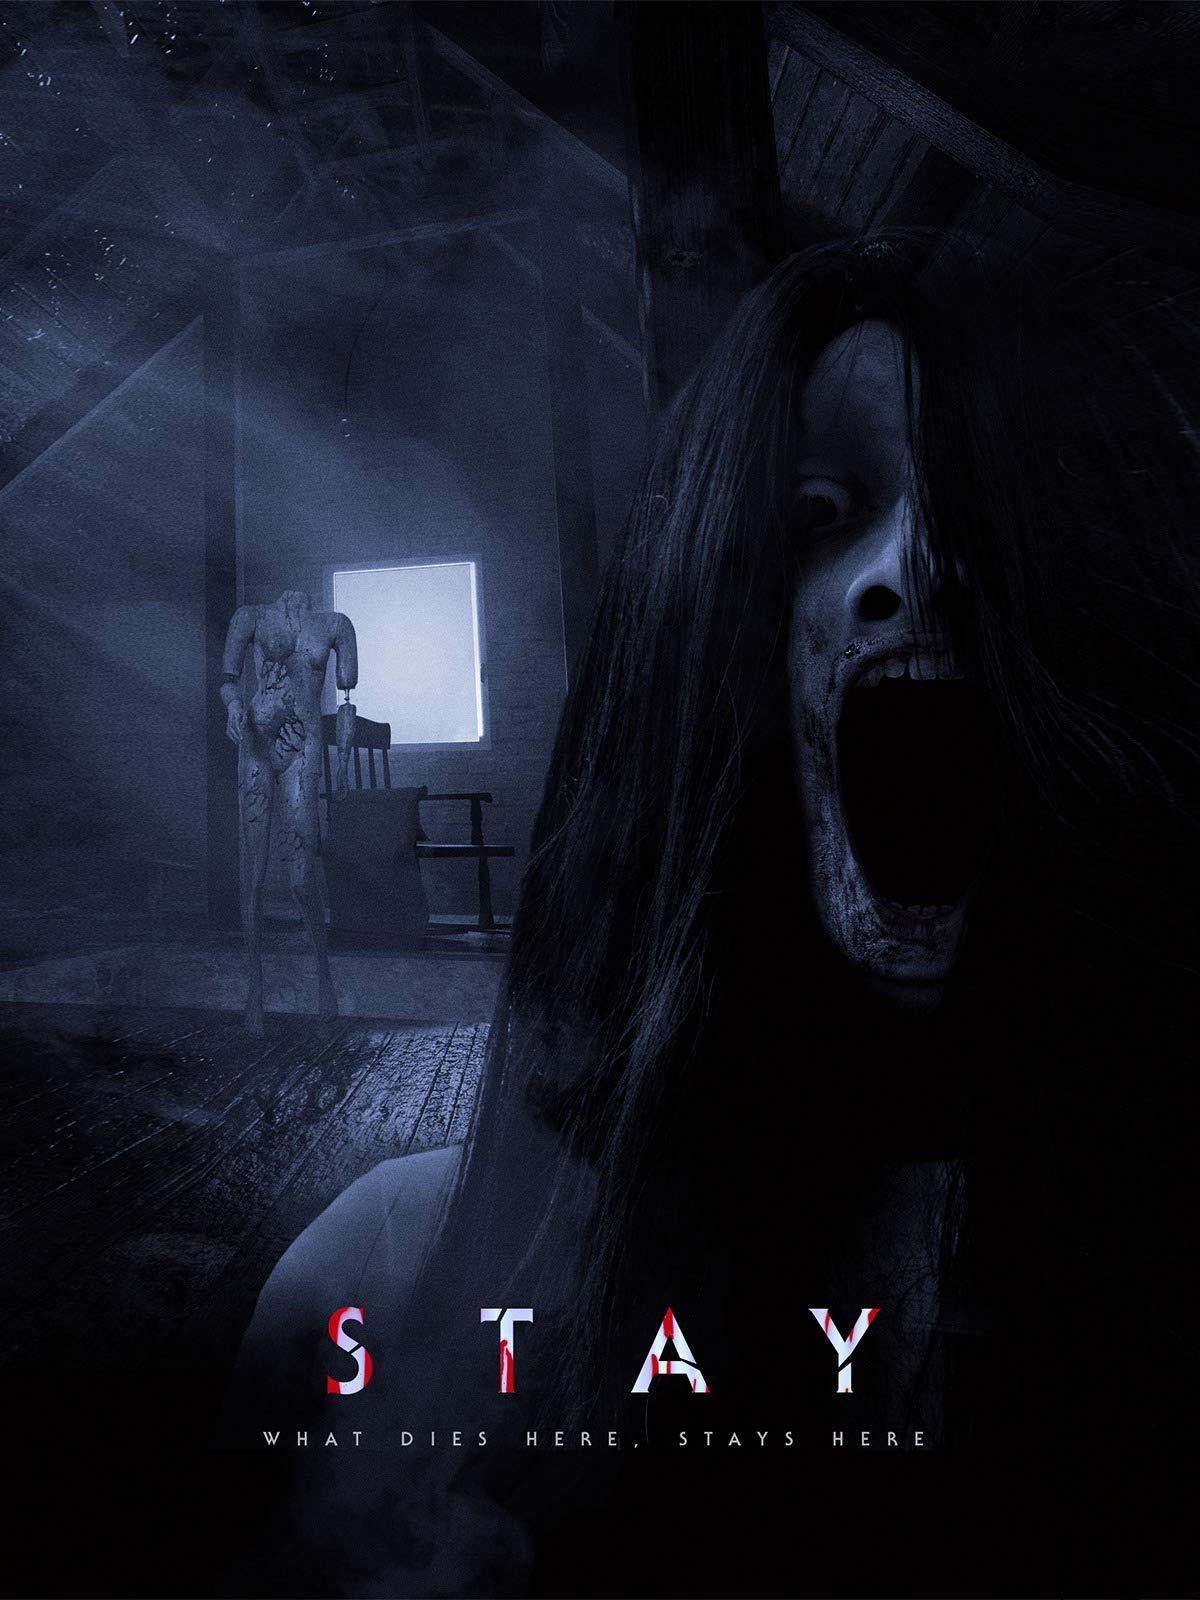 Stay on Amazon Prime Video UK